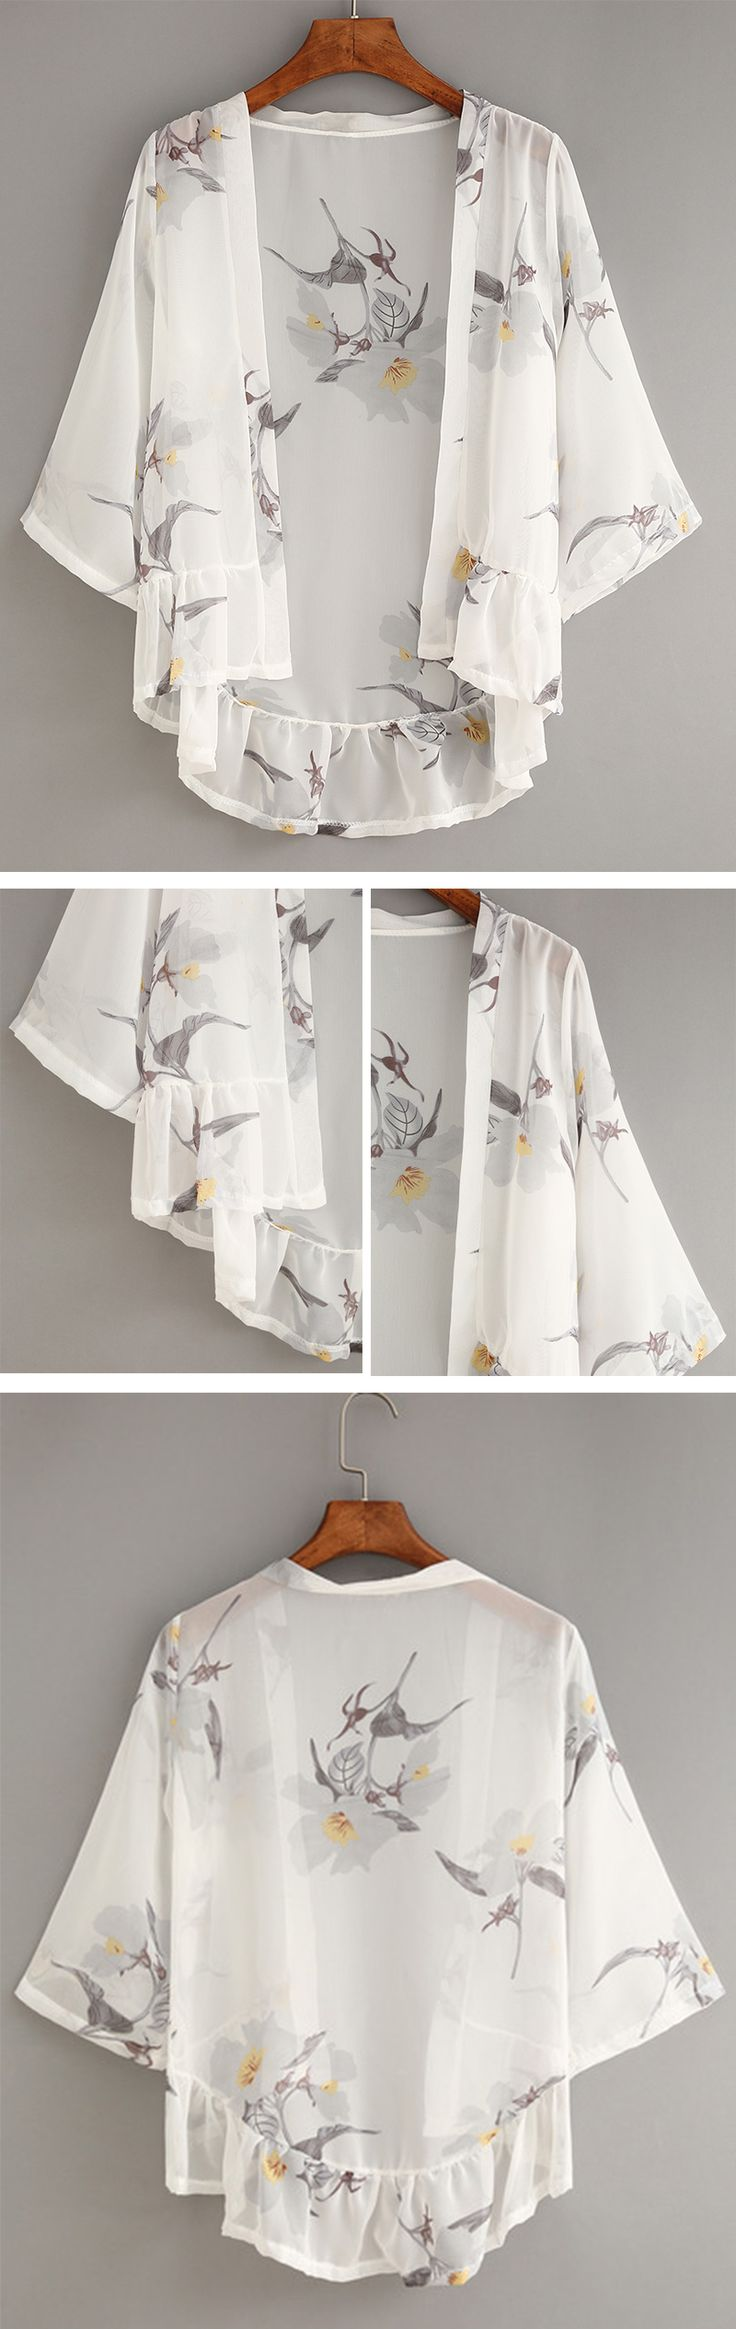 White Flower Print Ruffle Chiffon Kimono                                                                                                                                                     More